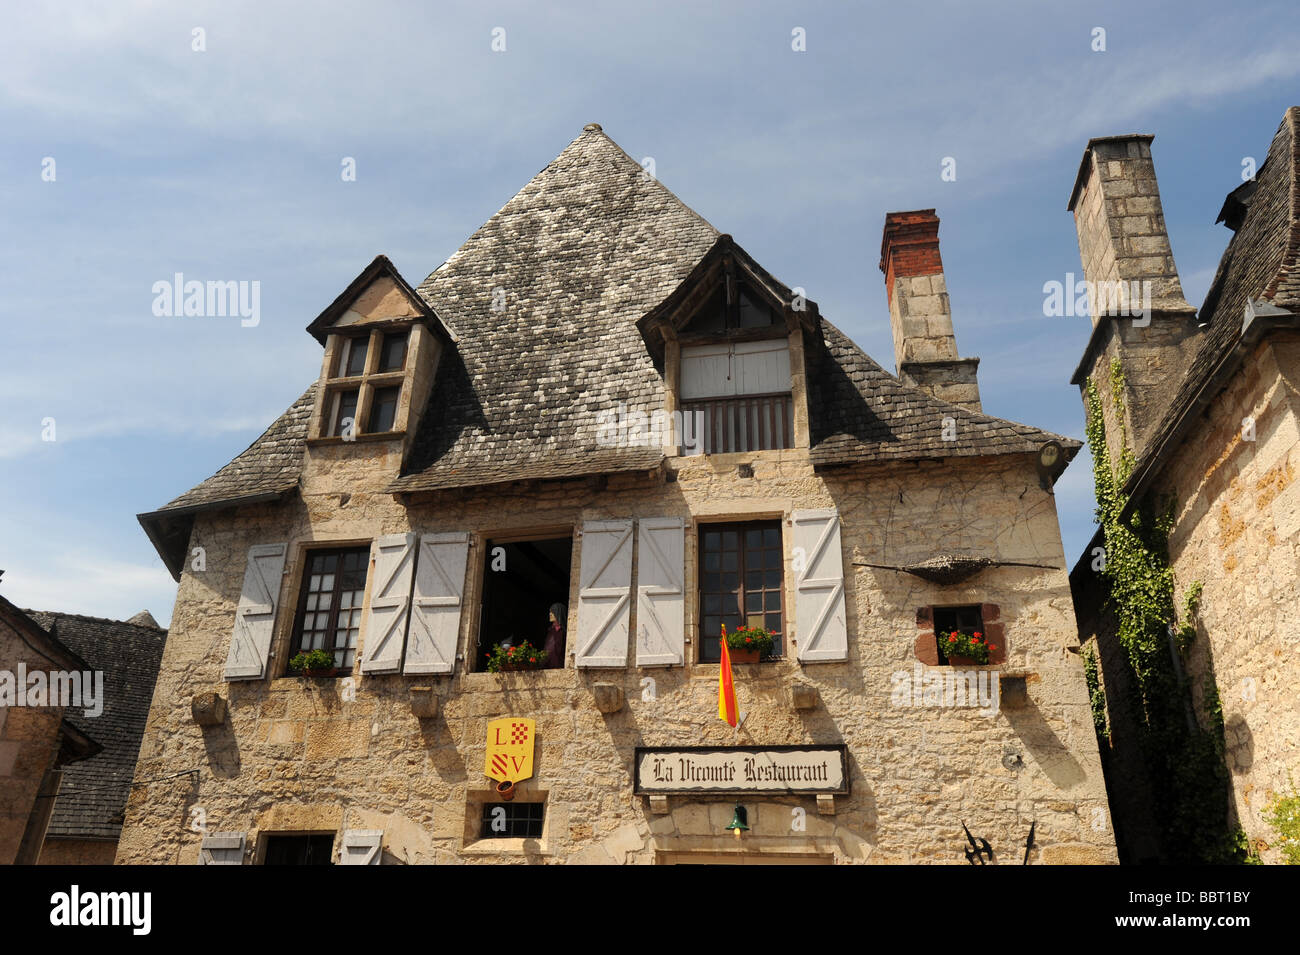 Turenne Dordogne France - Stock Image